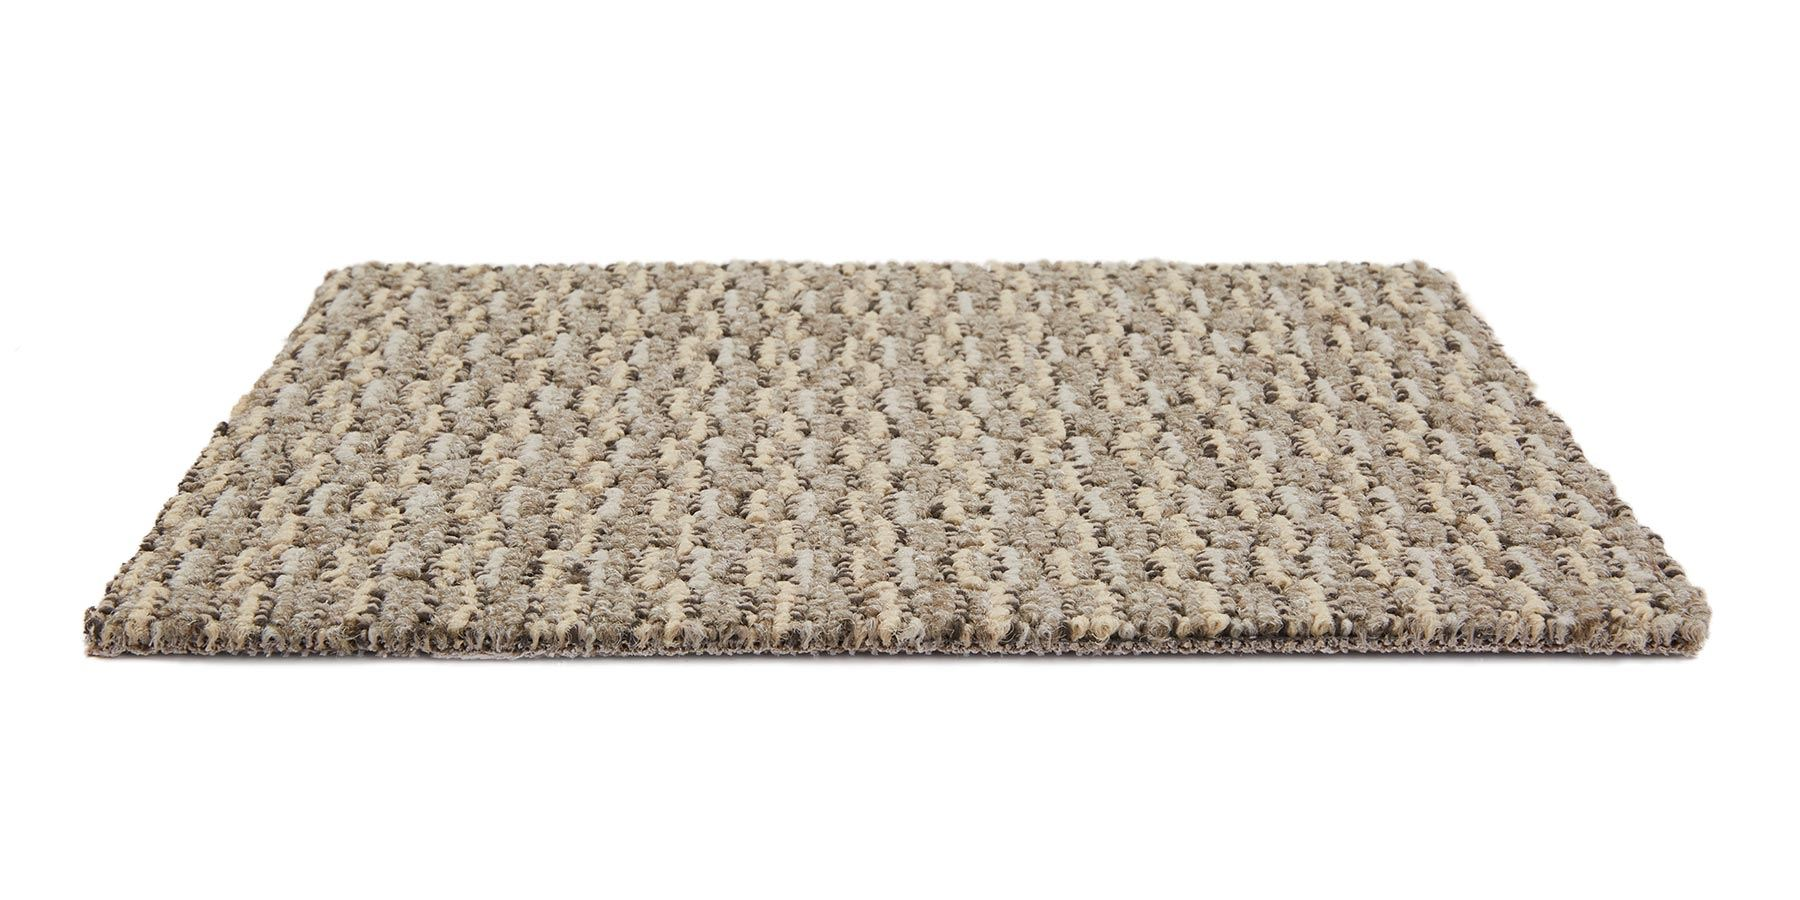 Aspire Commercial Carpet And Carpet Tile